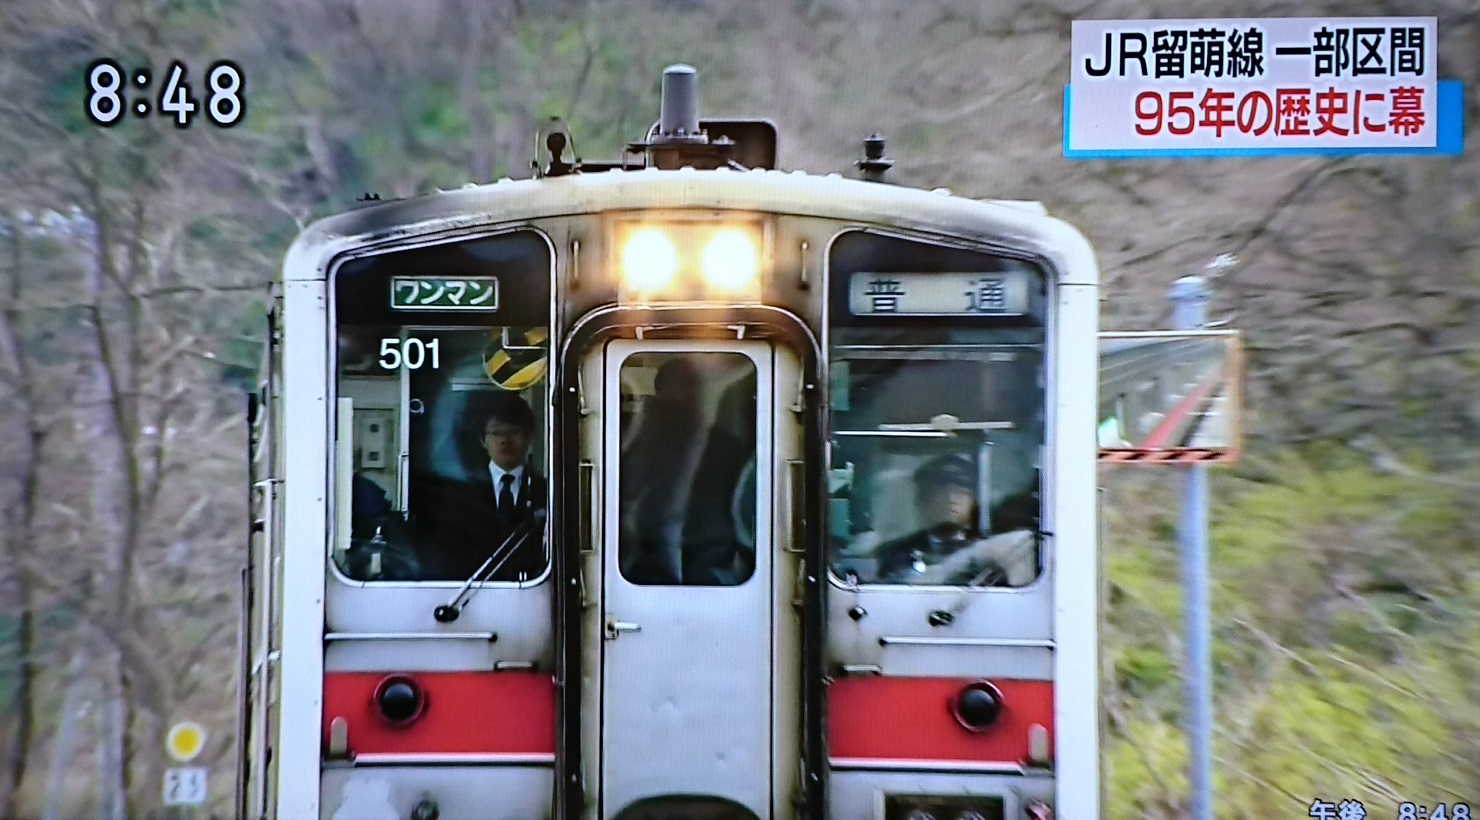 2016.12.4 留萌線の沿岸部が廃線 (5) 1480-820